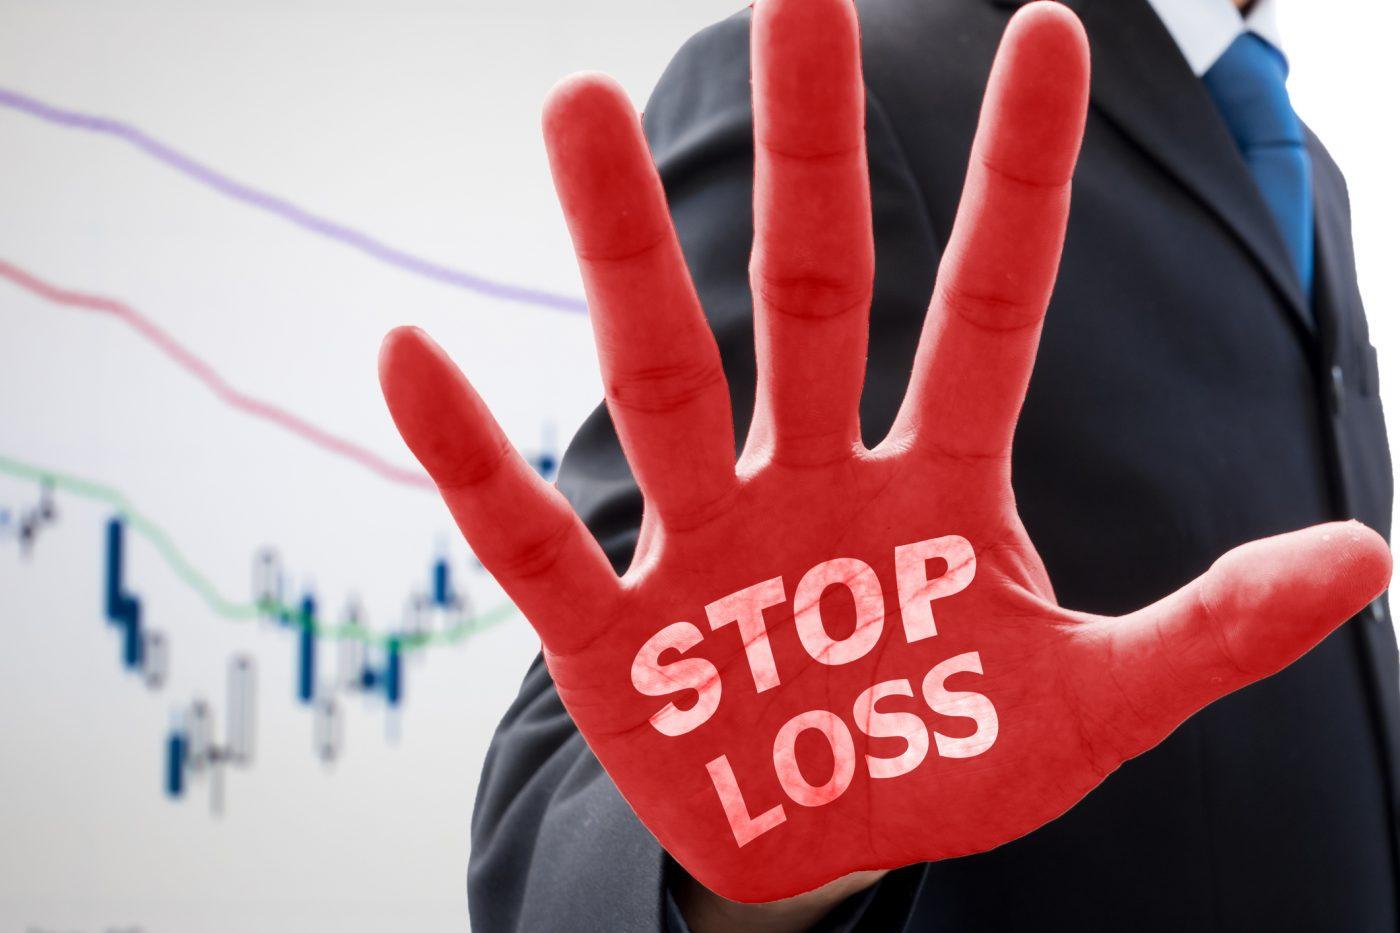 Stop Loss Strategies